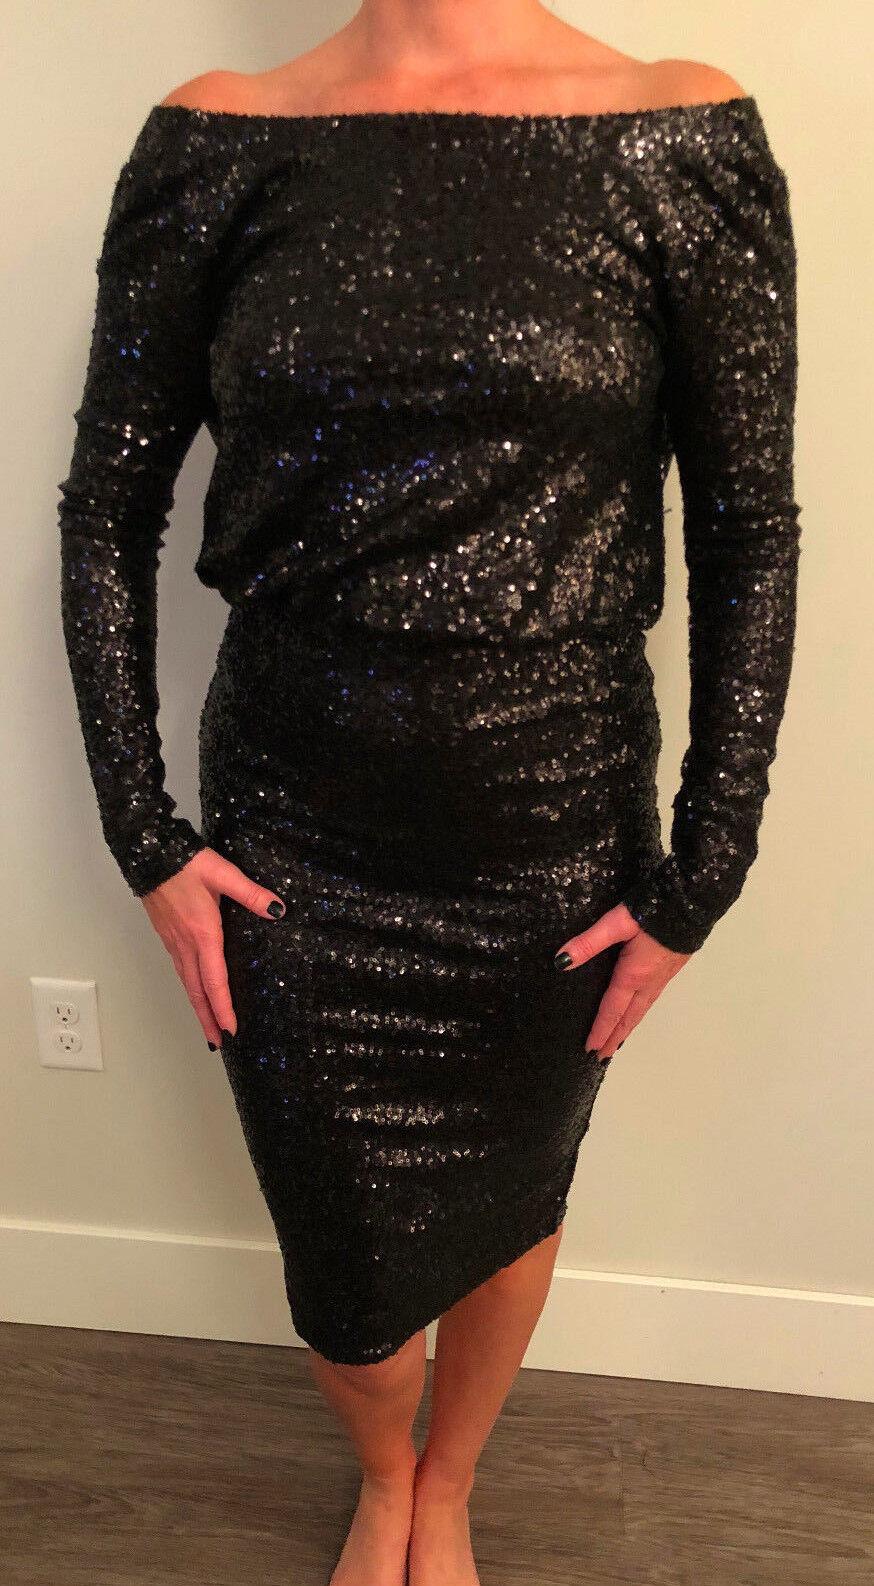 ASOS Woherren Sequin Off Shoulder Long Sleeve Fitted Dress NEW Größe US 4